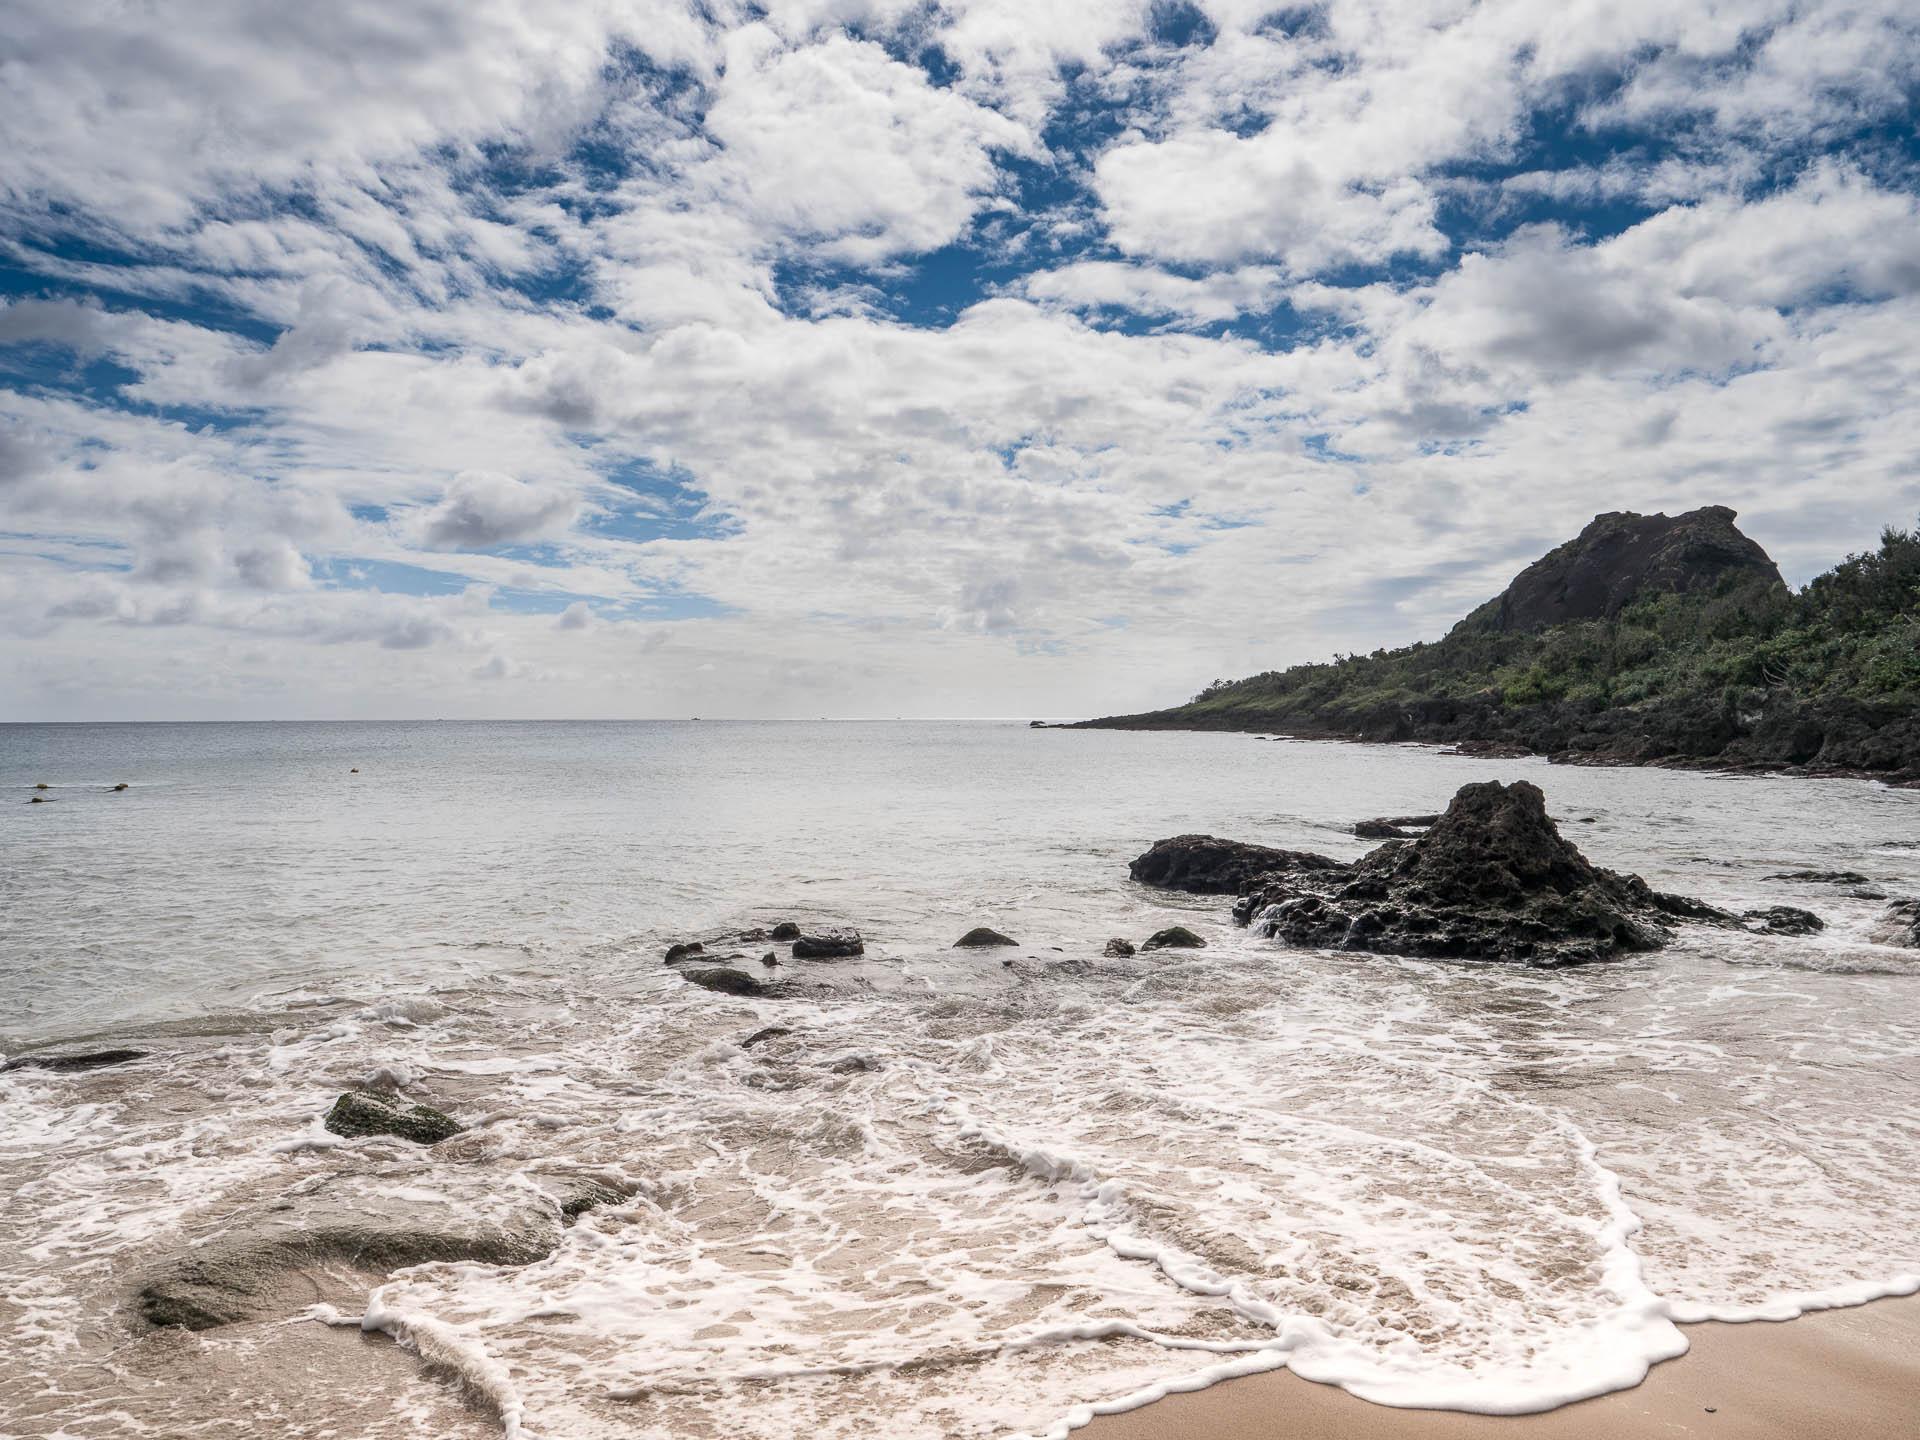 kenting plage - Les globe blogueurs - blog voyage nature